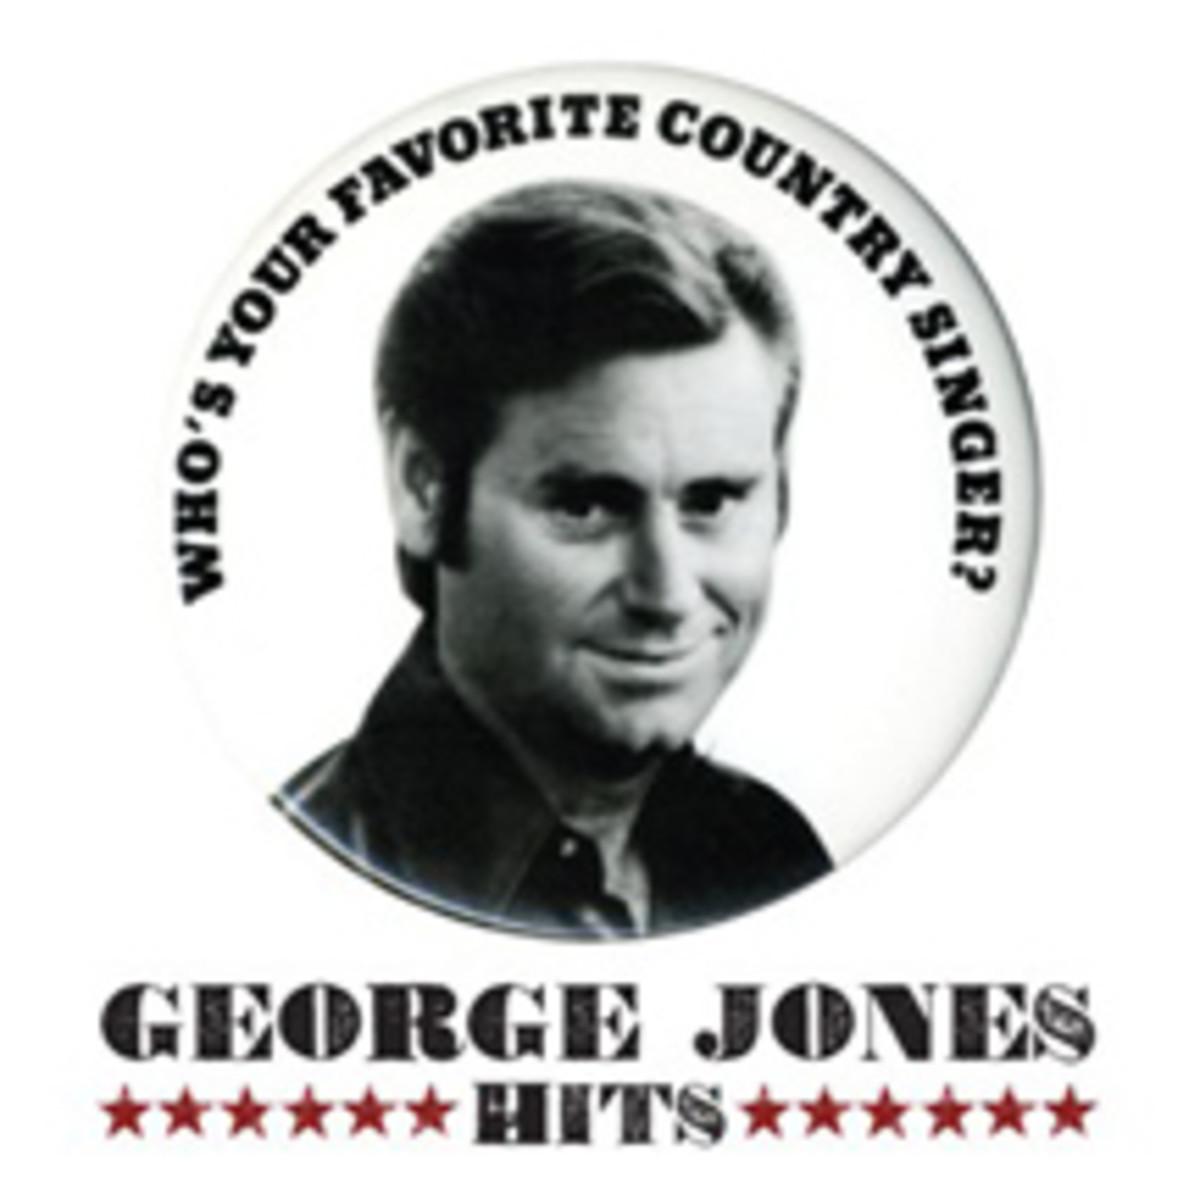 GeorgeJonesHits_Cover_sm 2